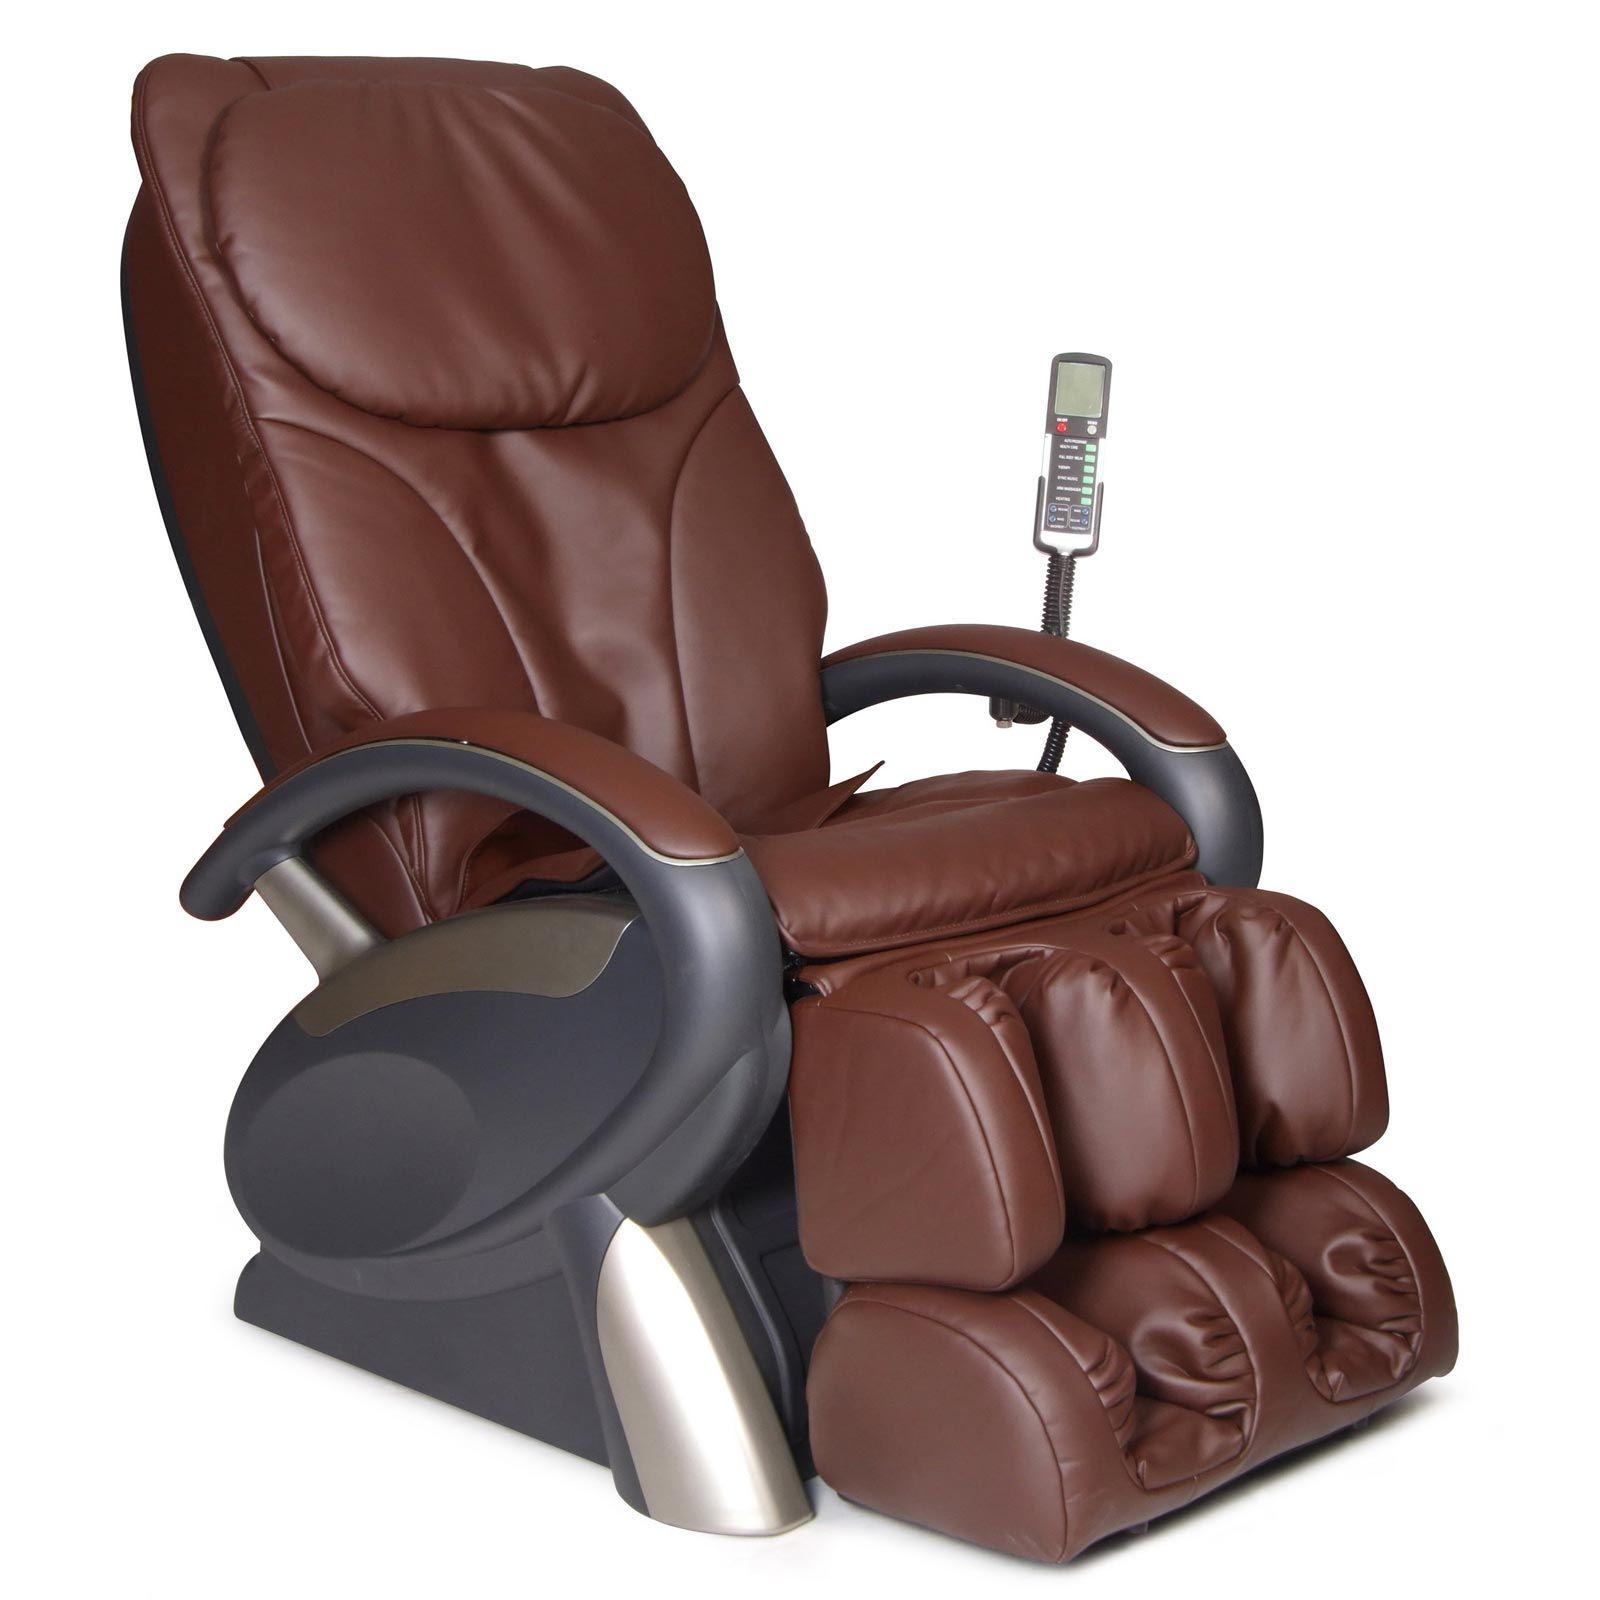 Cozzia 16020 Feel Good Series Shiatsu Massage Chair